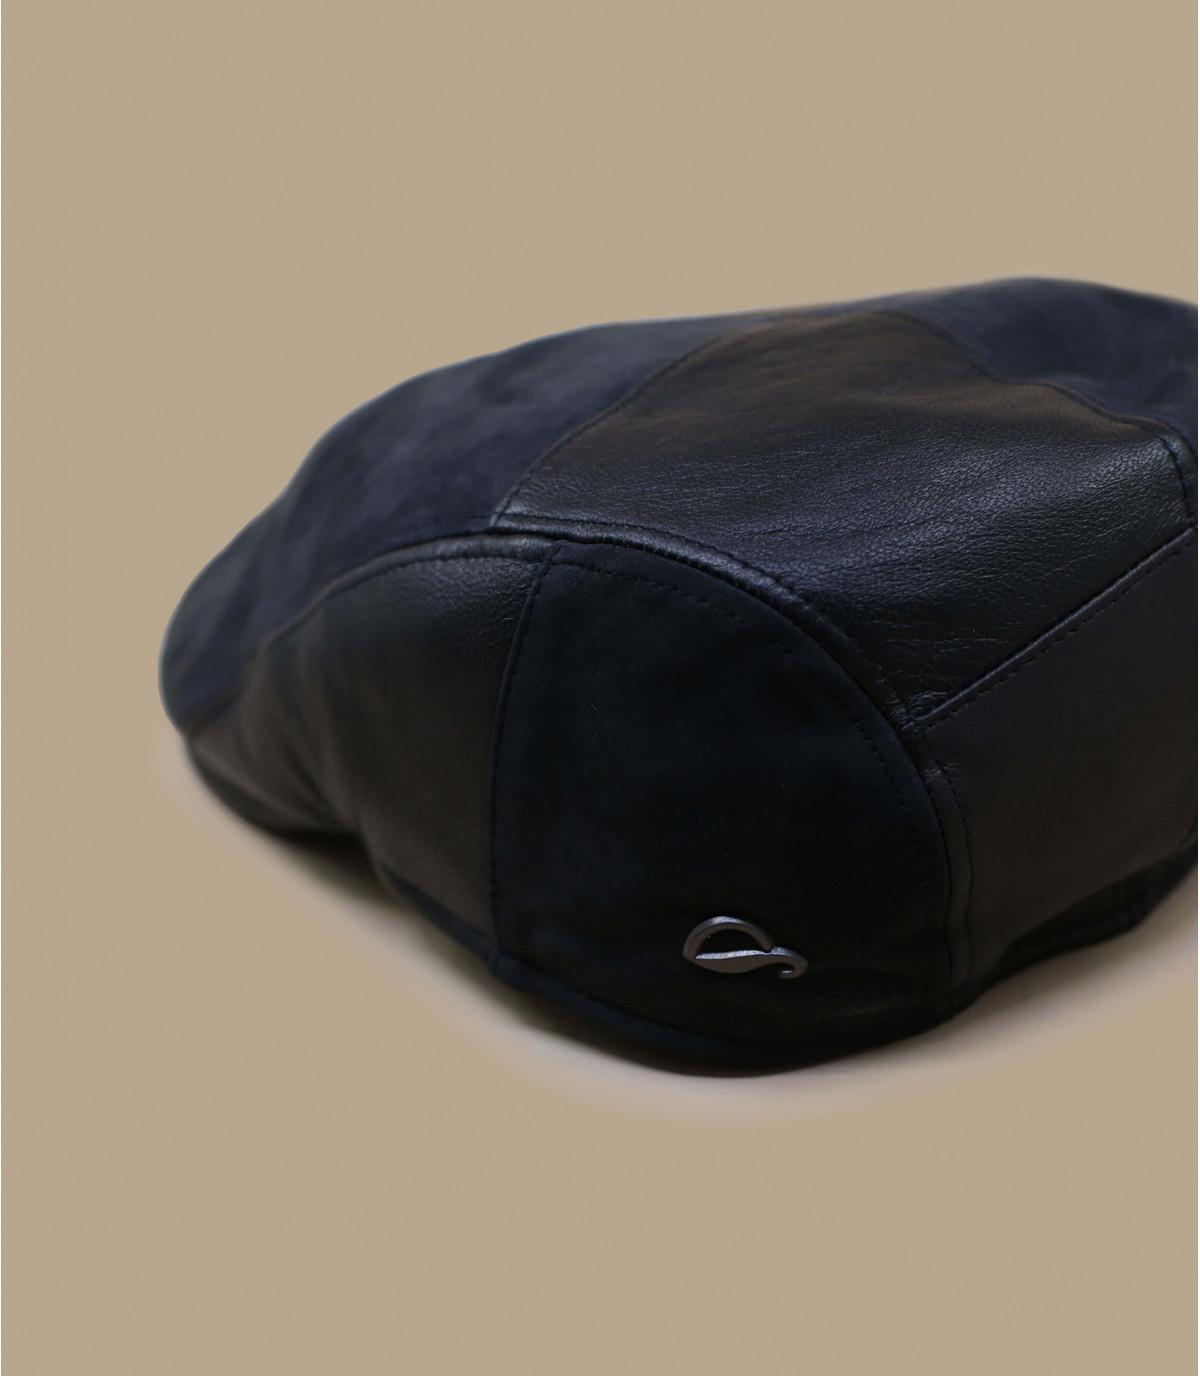 Dettagli Brighton Patchwork Leather black - image 2